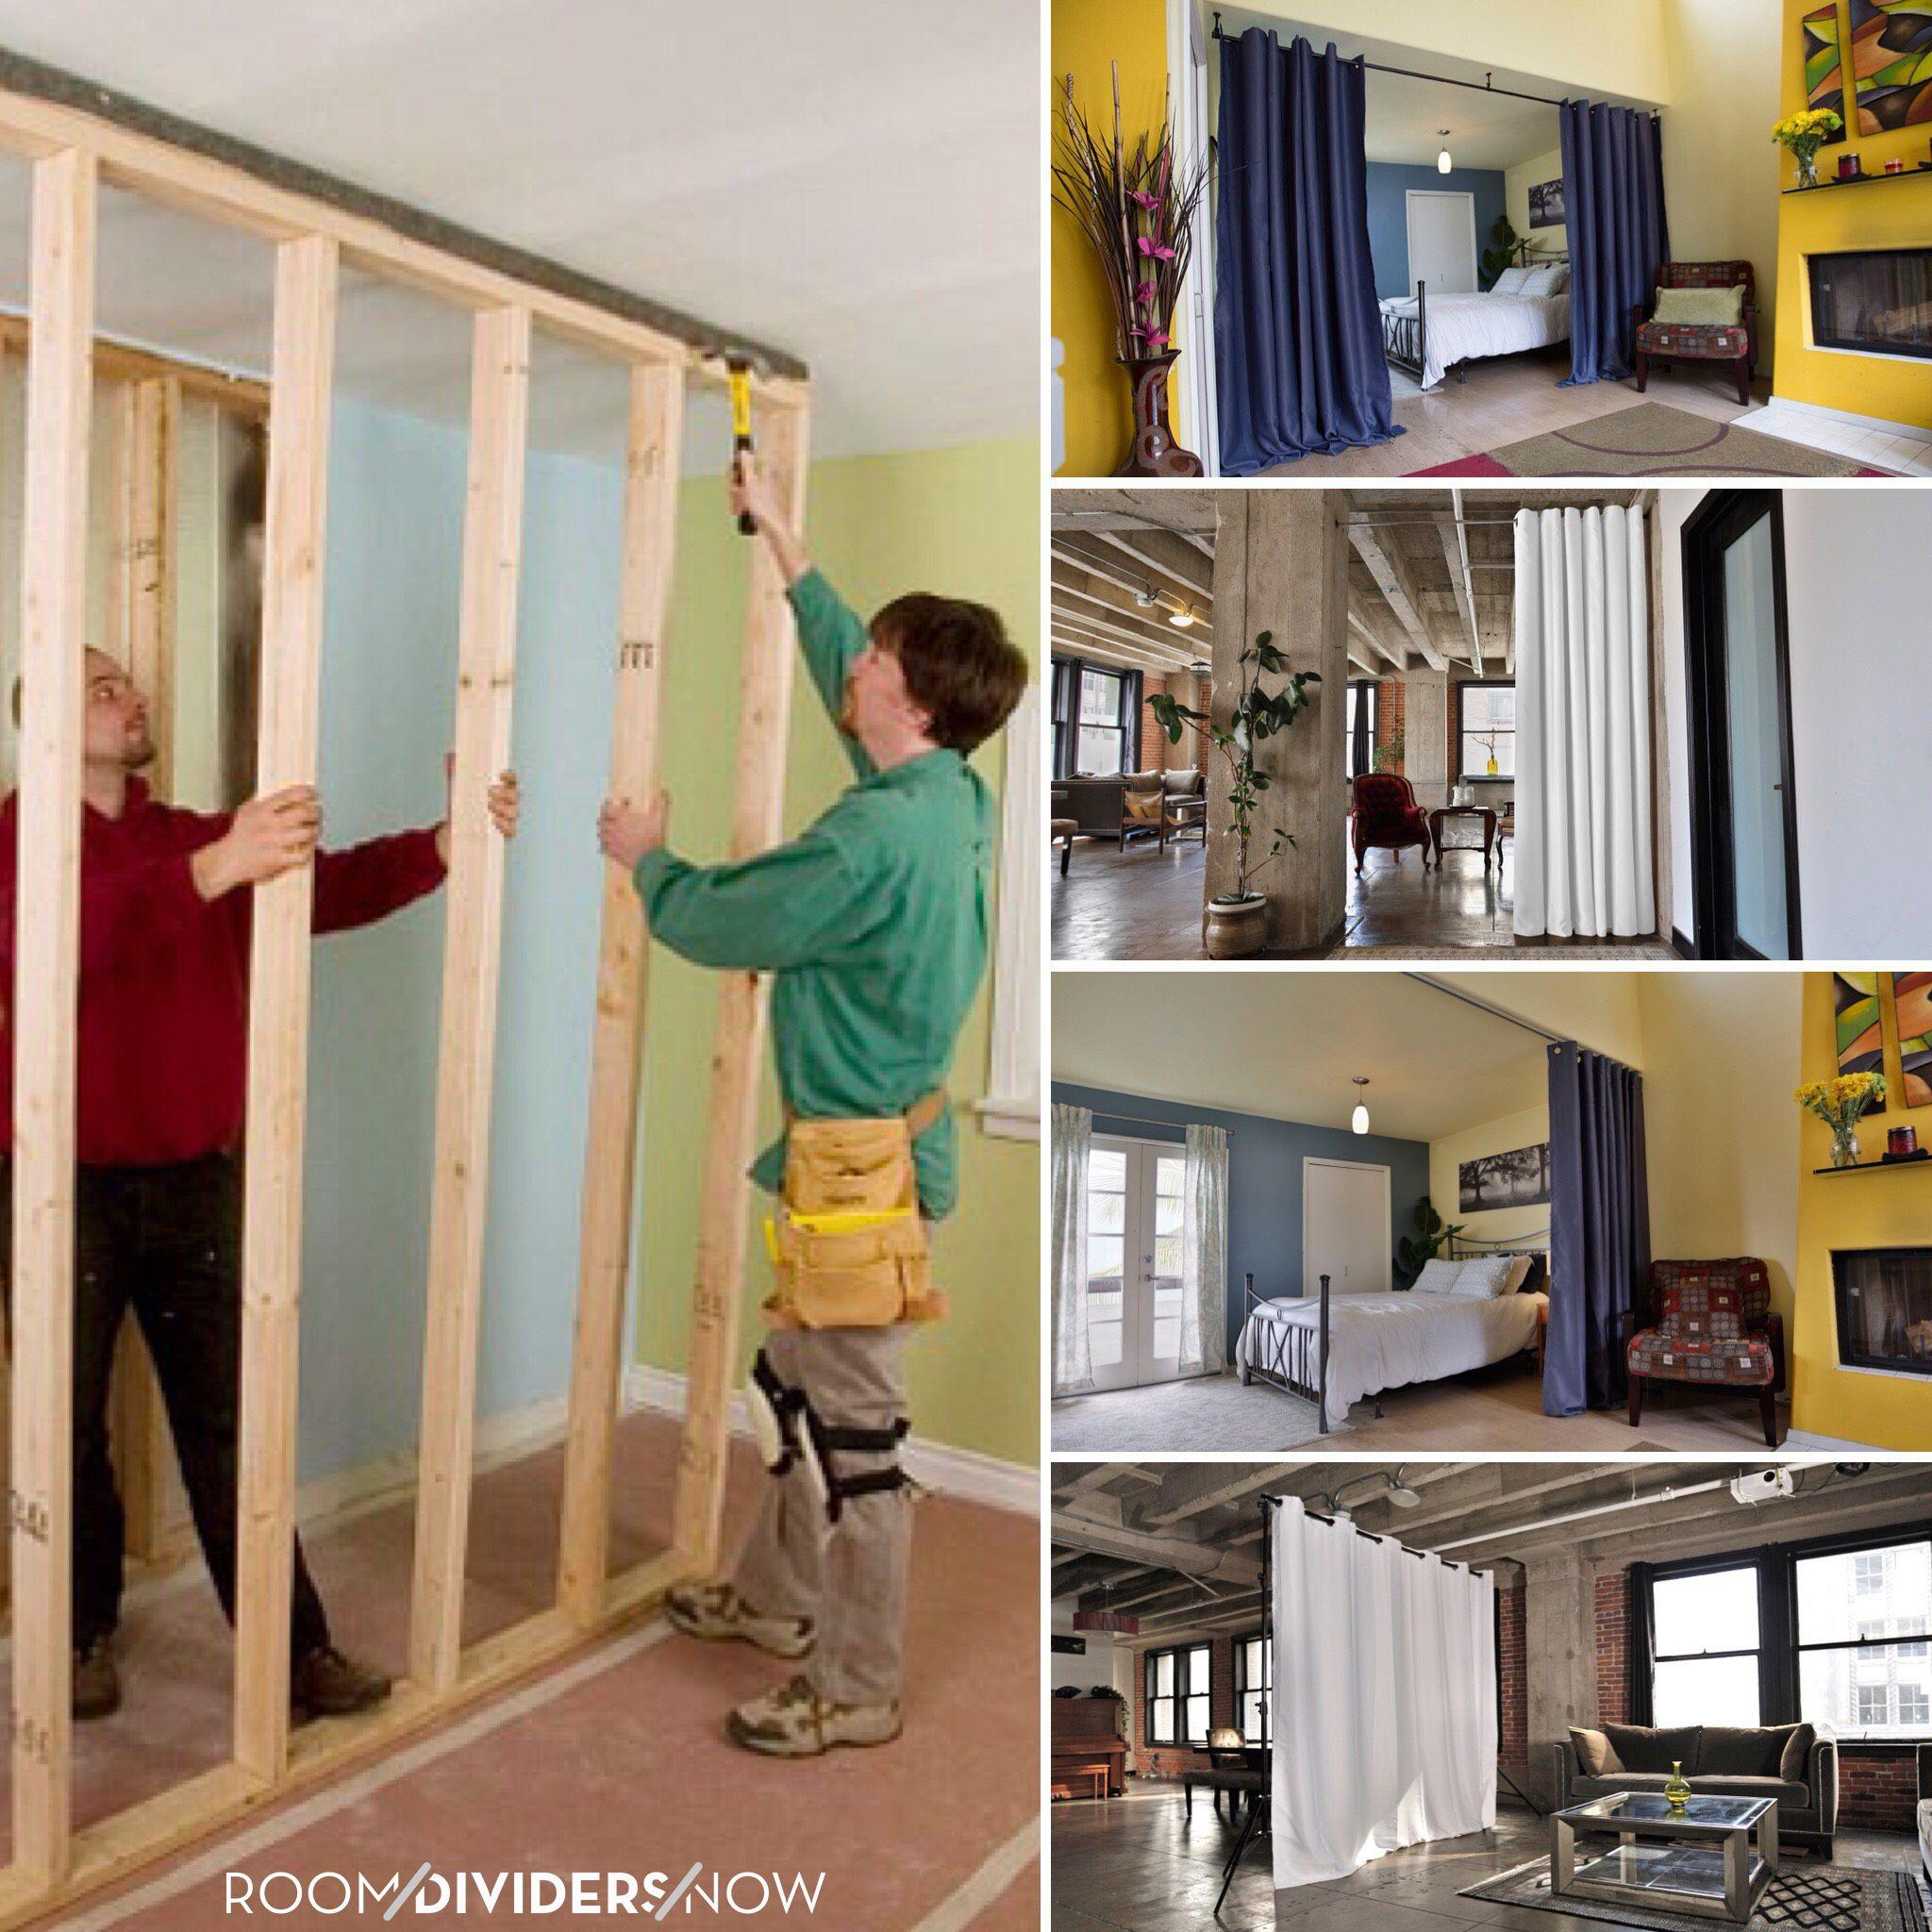 Walls Are Expensive - Get A Room Divider Kit Inste